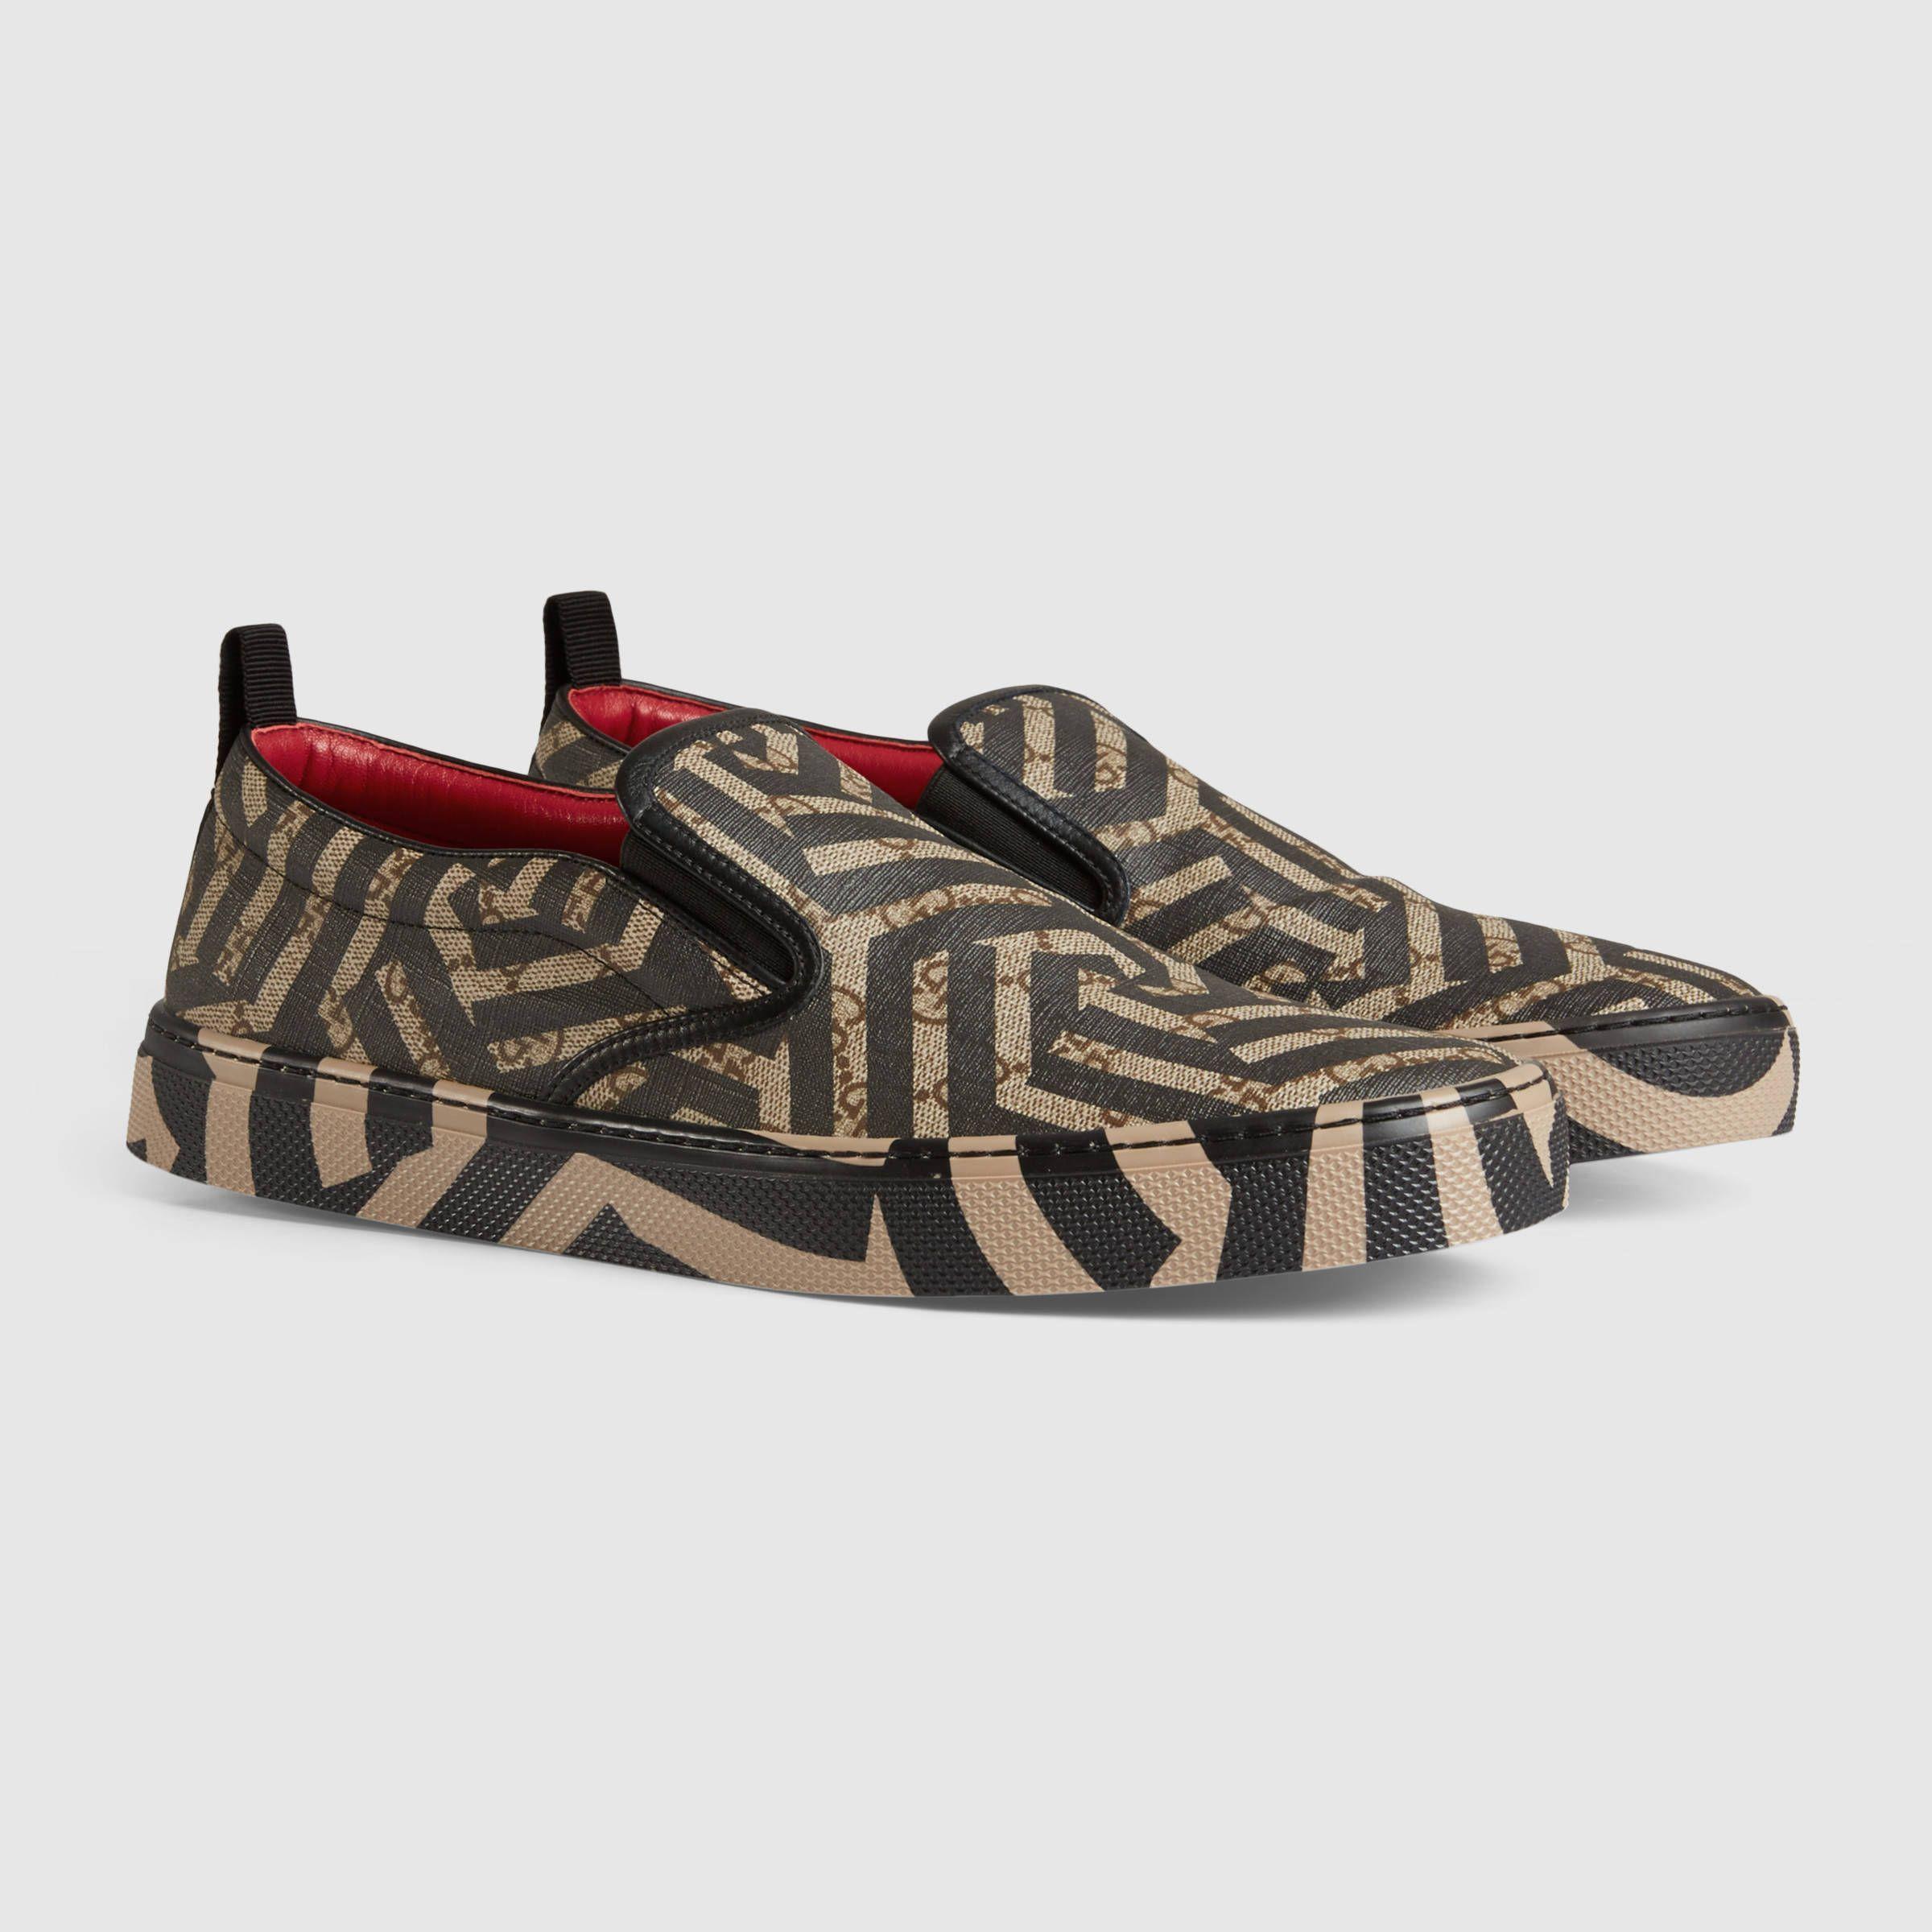 da000d296e6 Gucci Men - GG Caleido sneaker - 407362KVW409761 Gucci Men